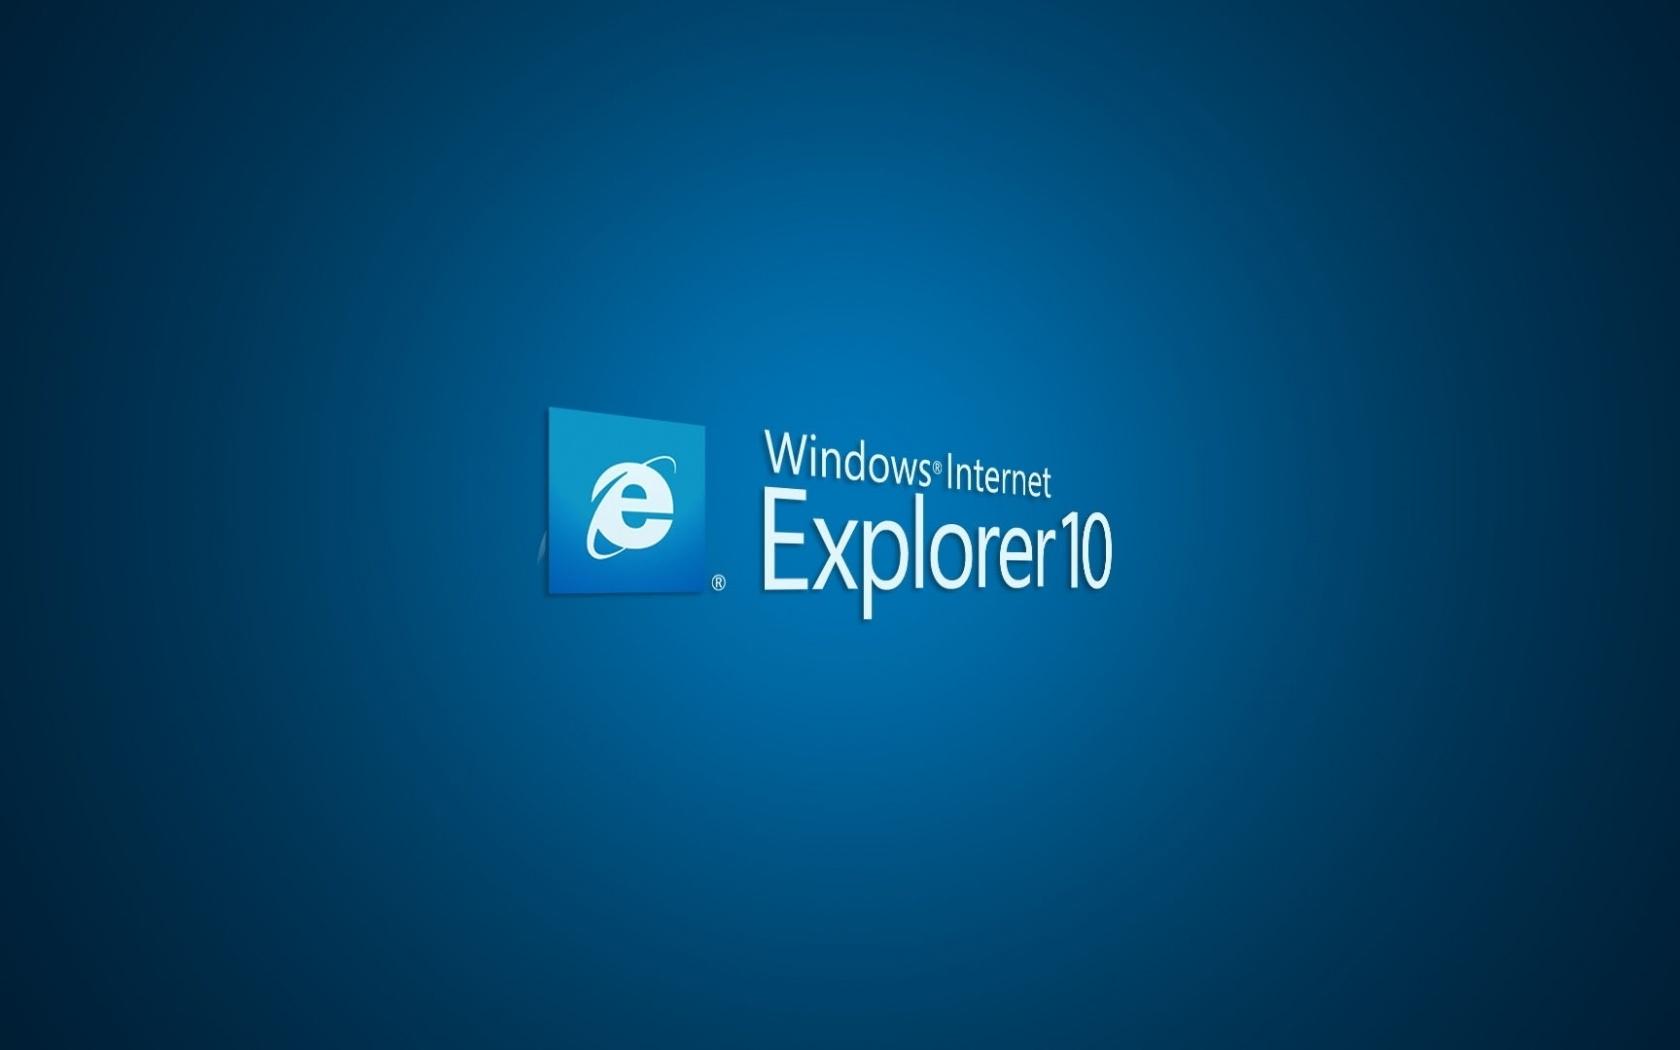 1680x1050 Microsoft Windows Internet Explorer 10 desktop PC and Mac ...